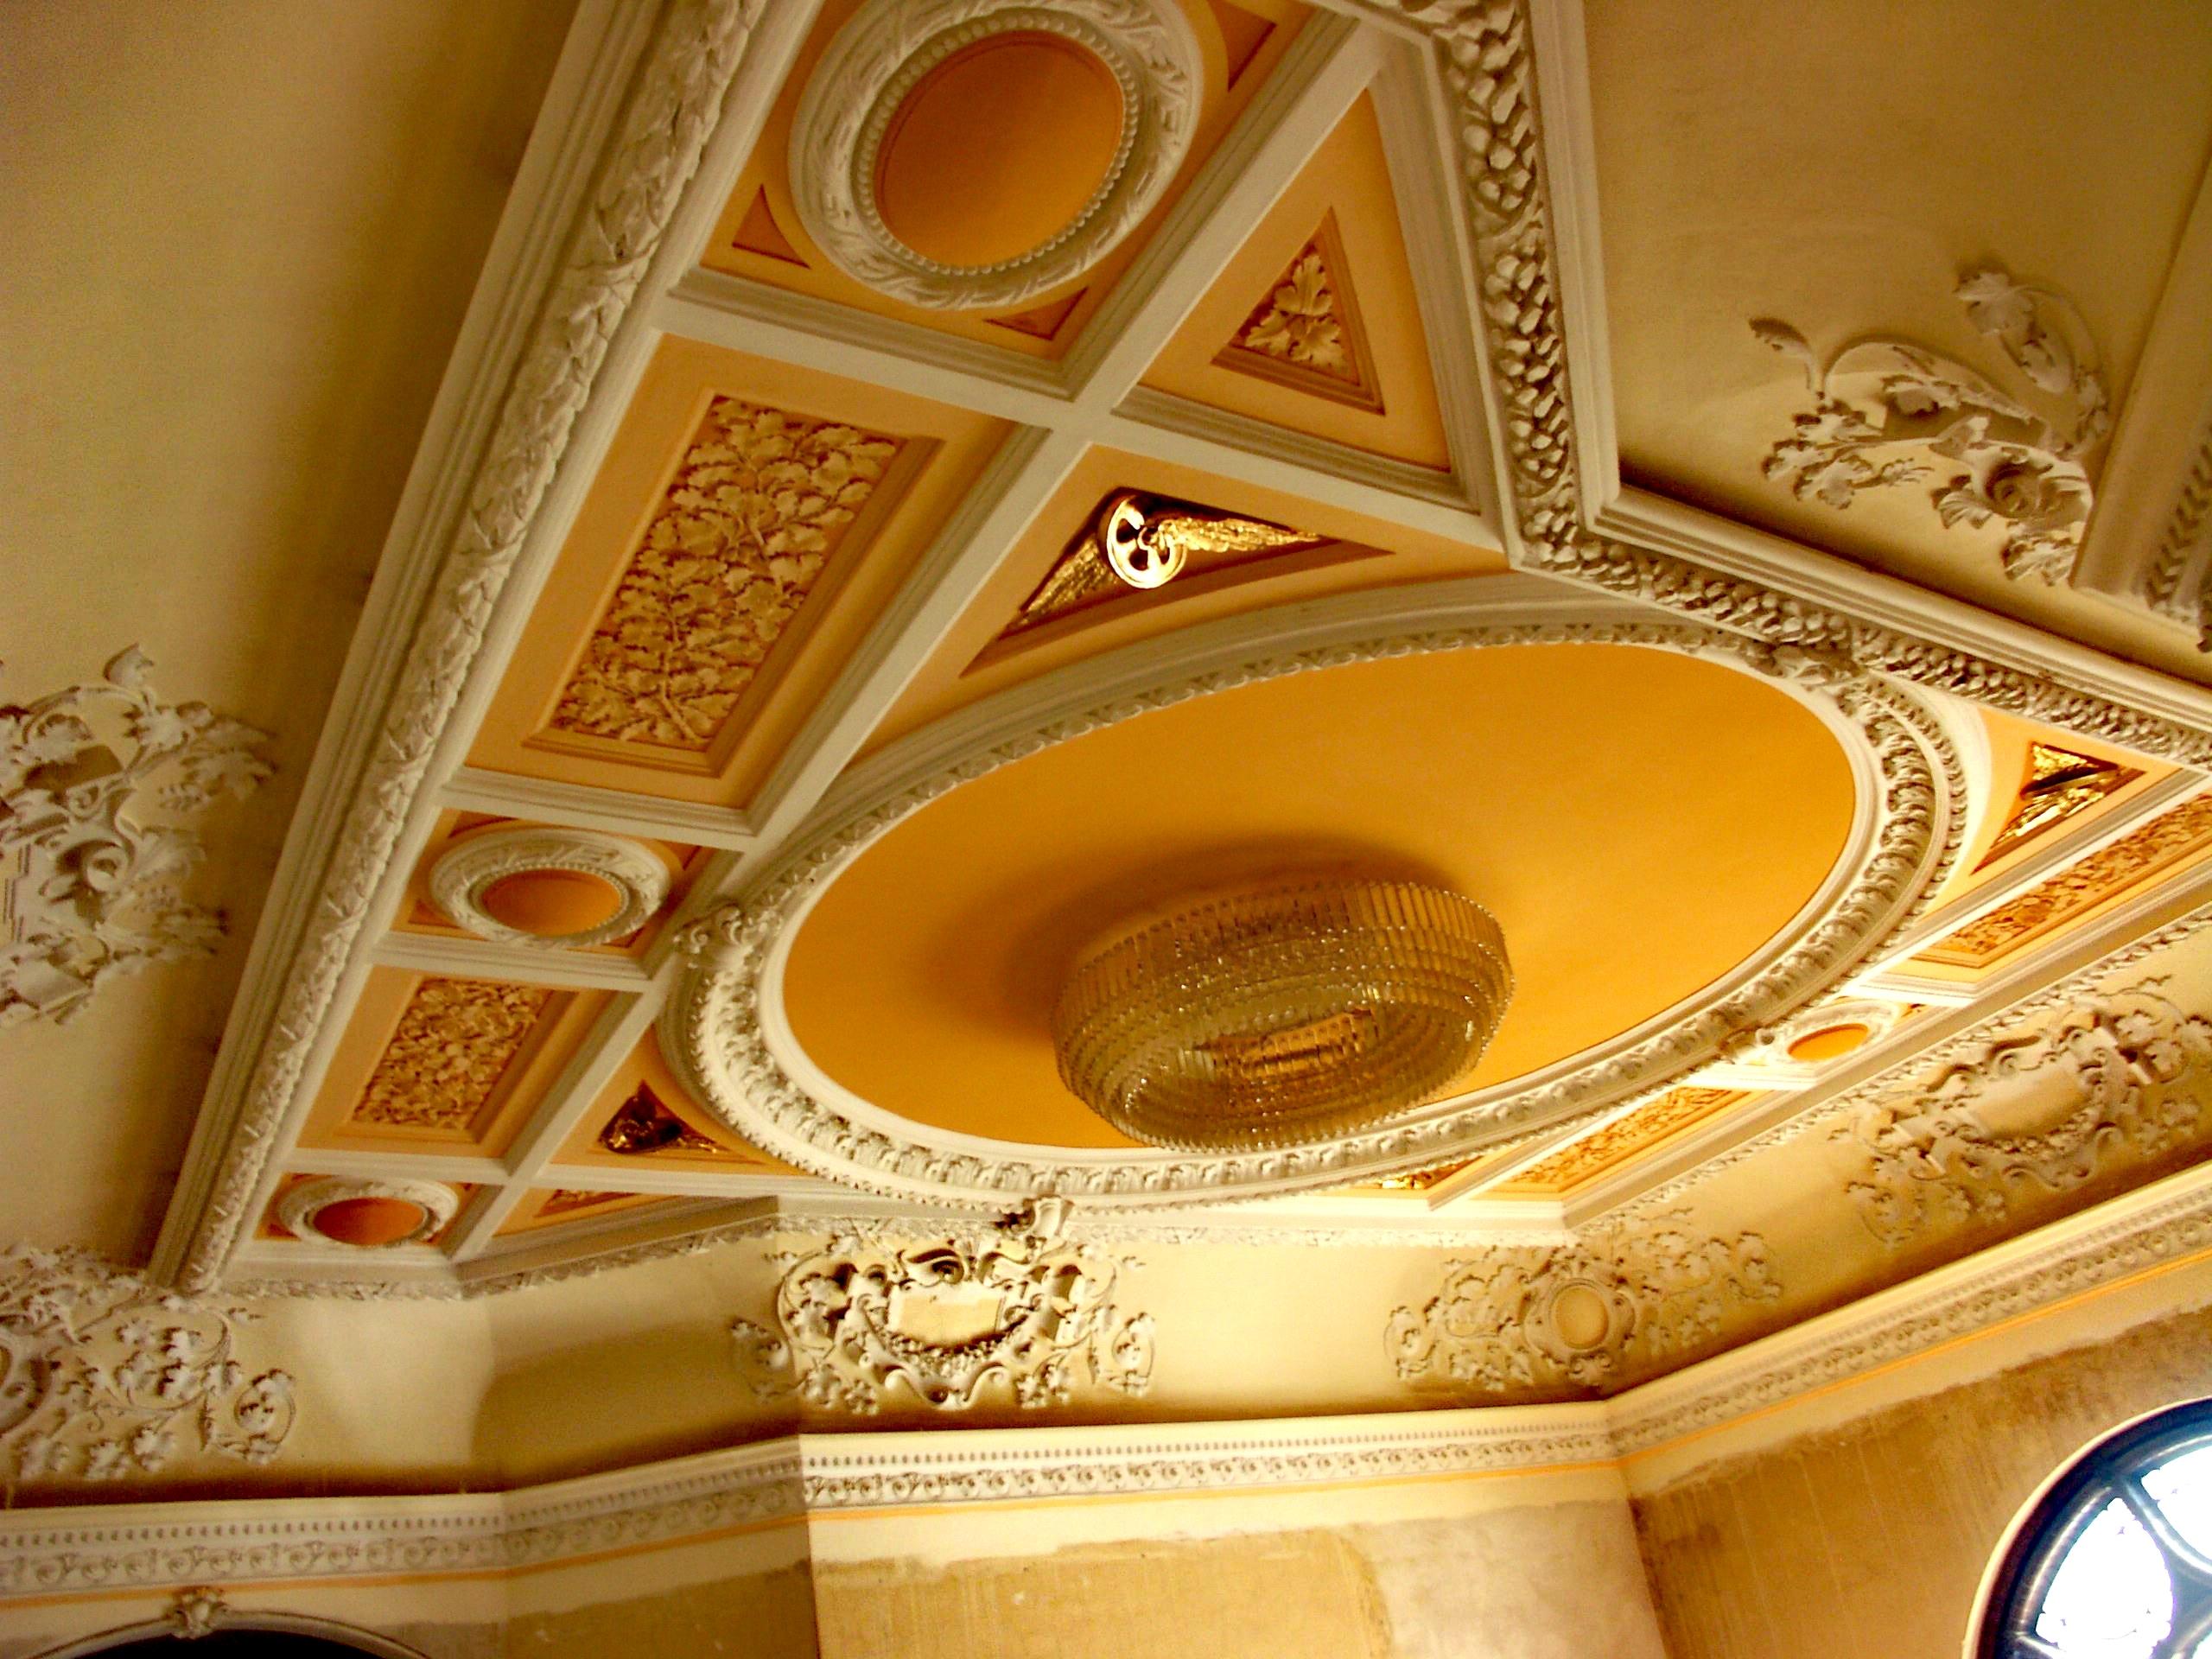 Kronleuchter Treppe ~ Datei:stuckdecke u. kronleuchter im treppenportal.rbd.jpg u2013 wikipedia